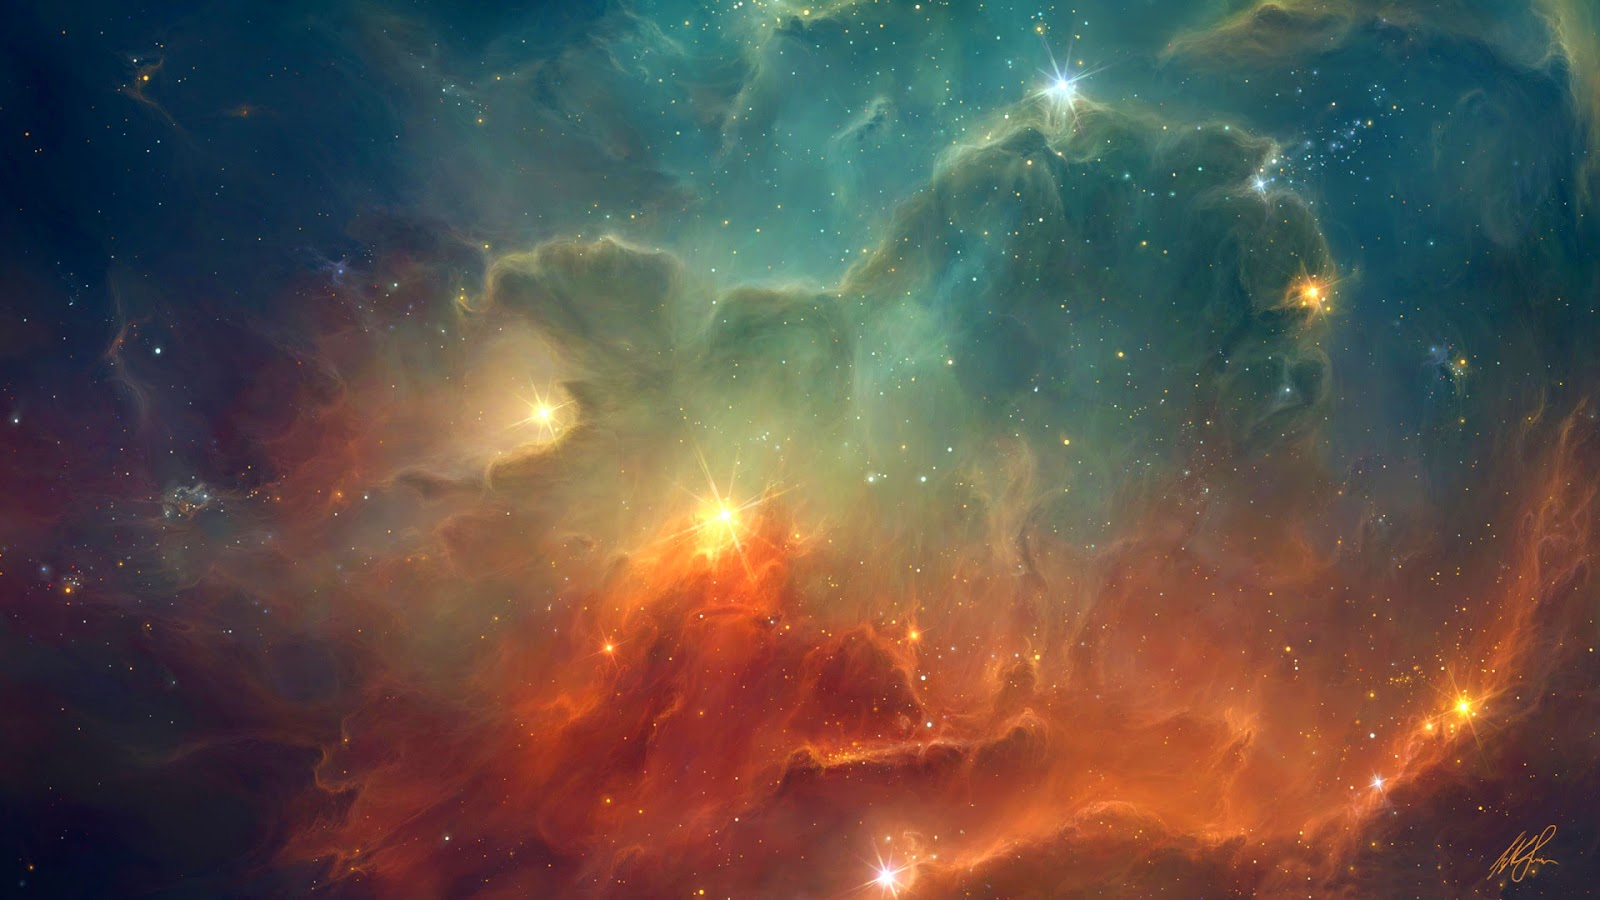 Papel de Parede Espaço Nebulosas Coloridas Space Wallpaper hd image